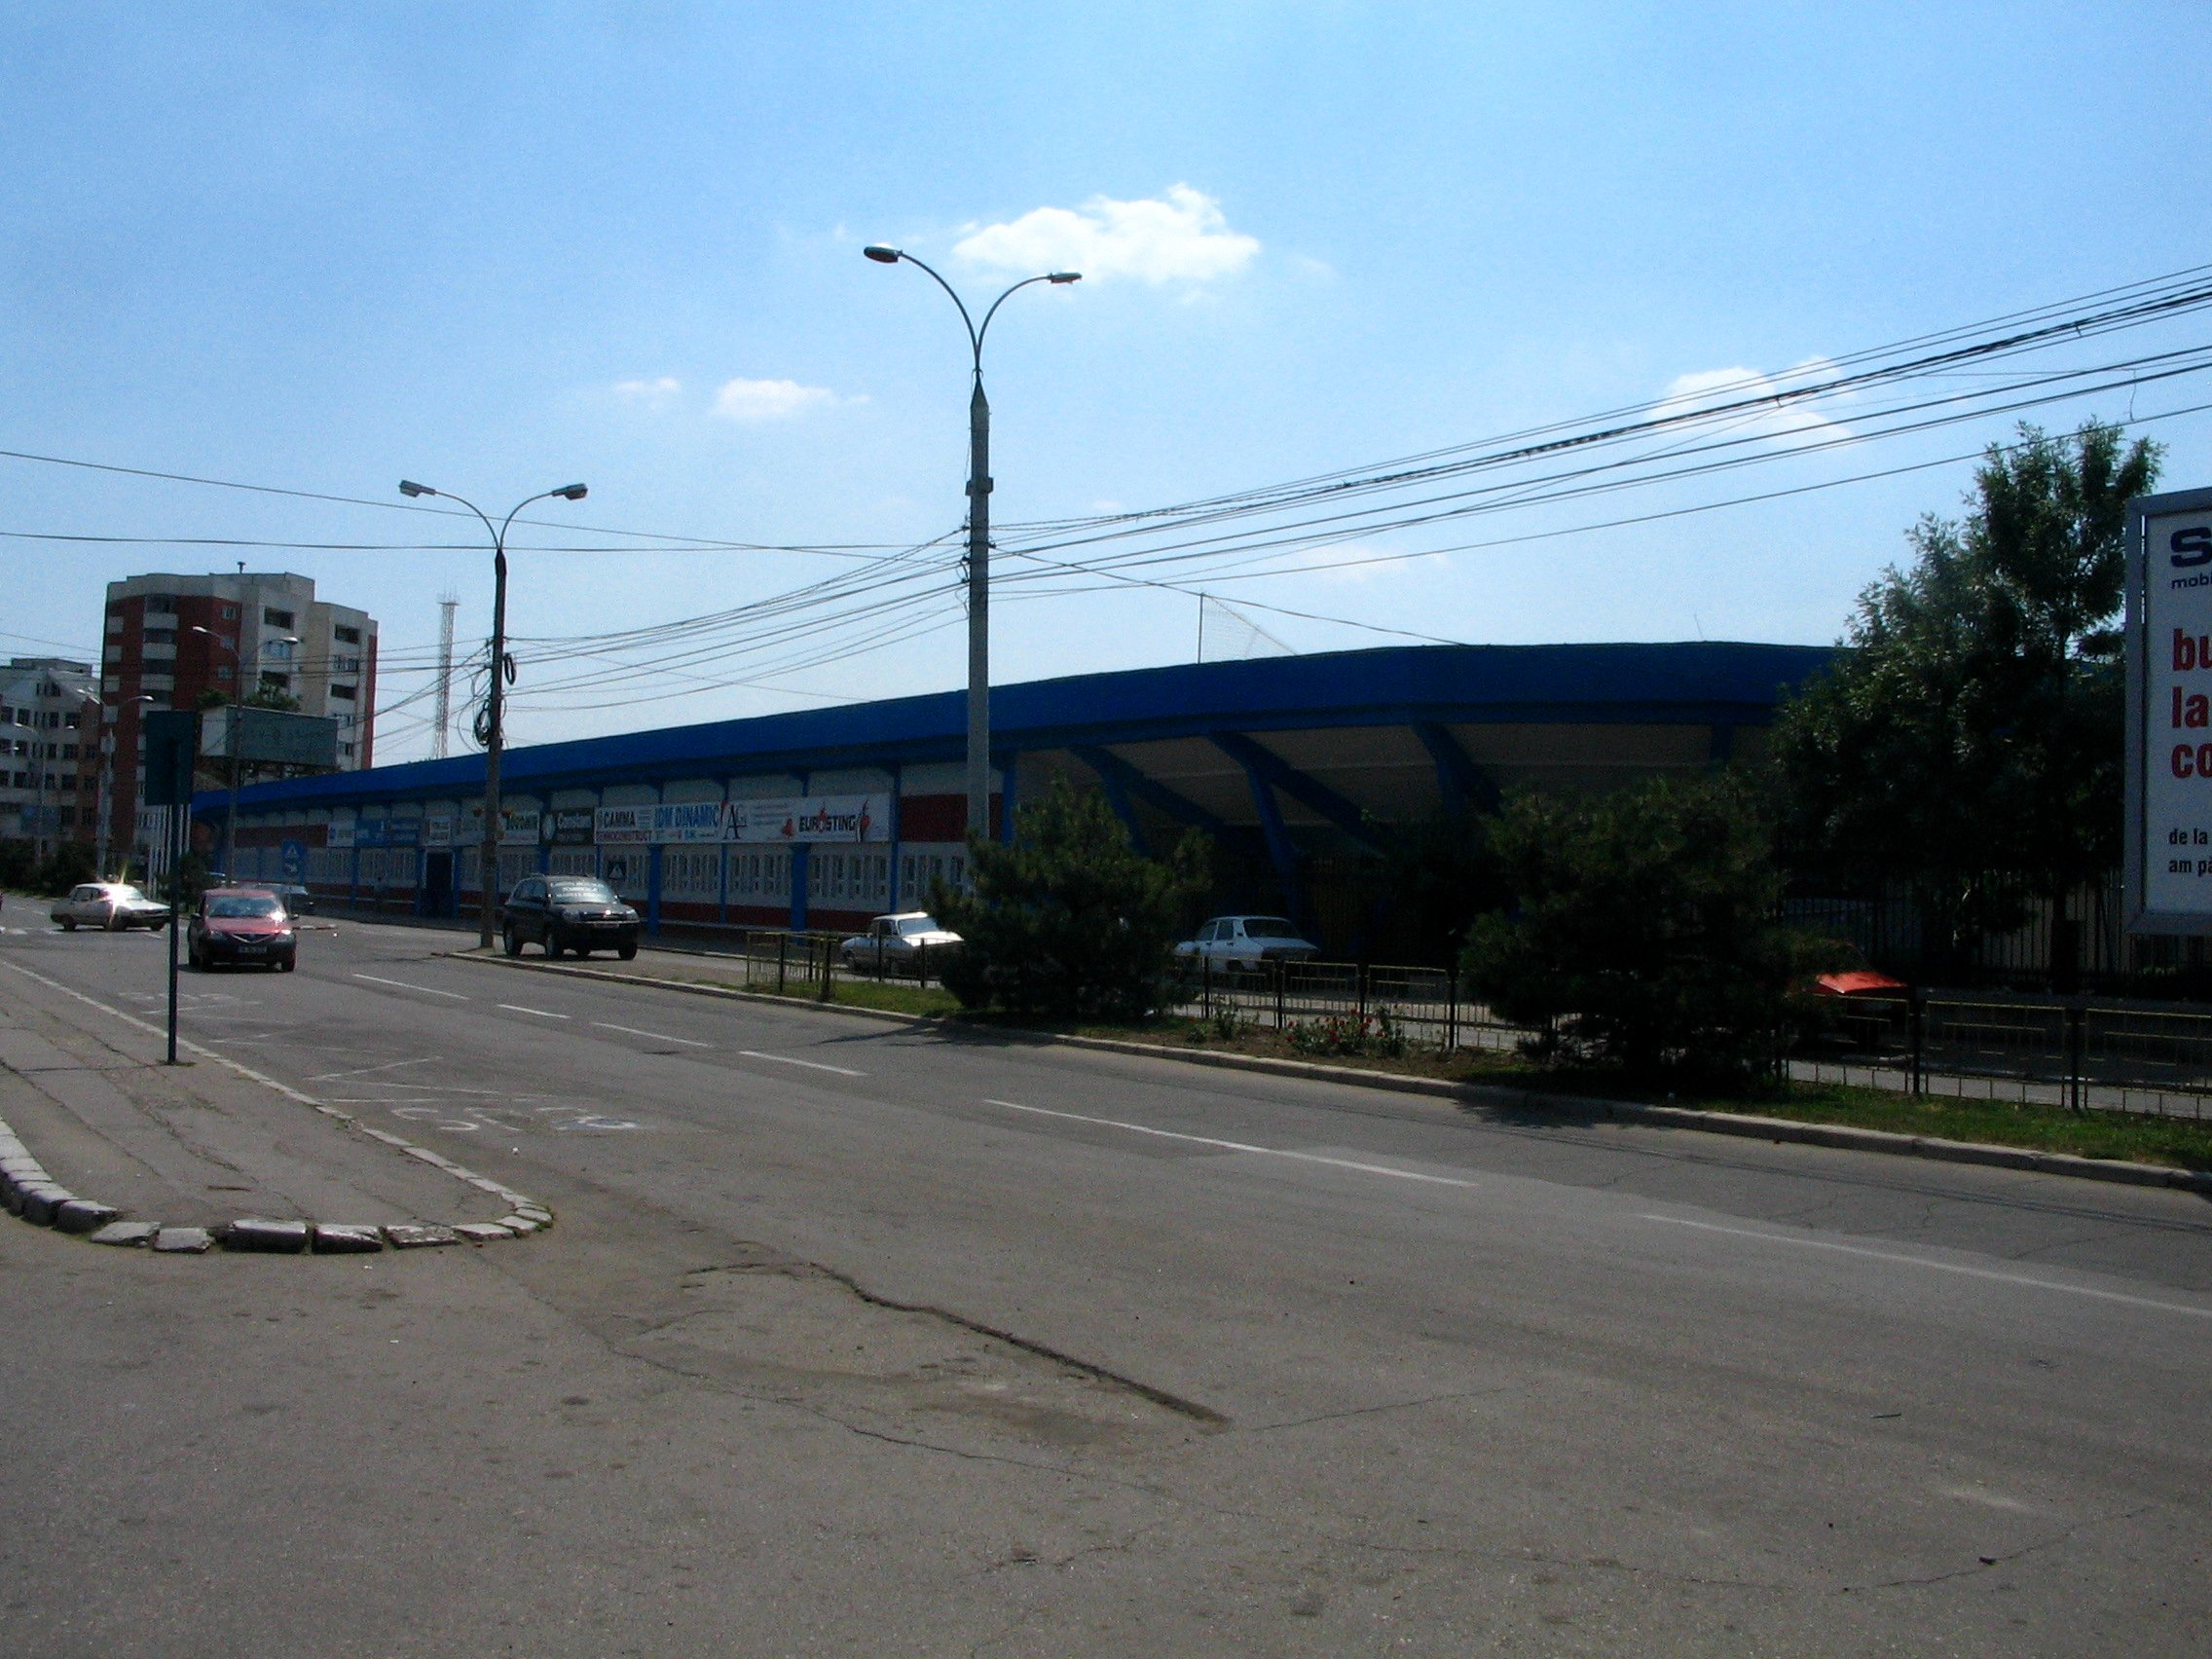 Fişier:Bz stadium gloria.jpg